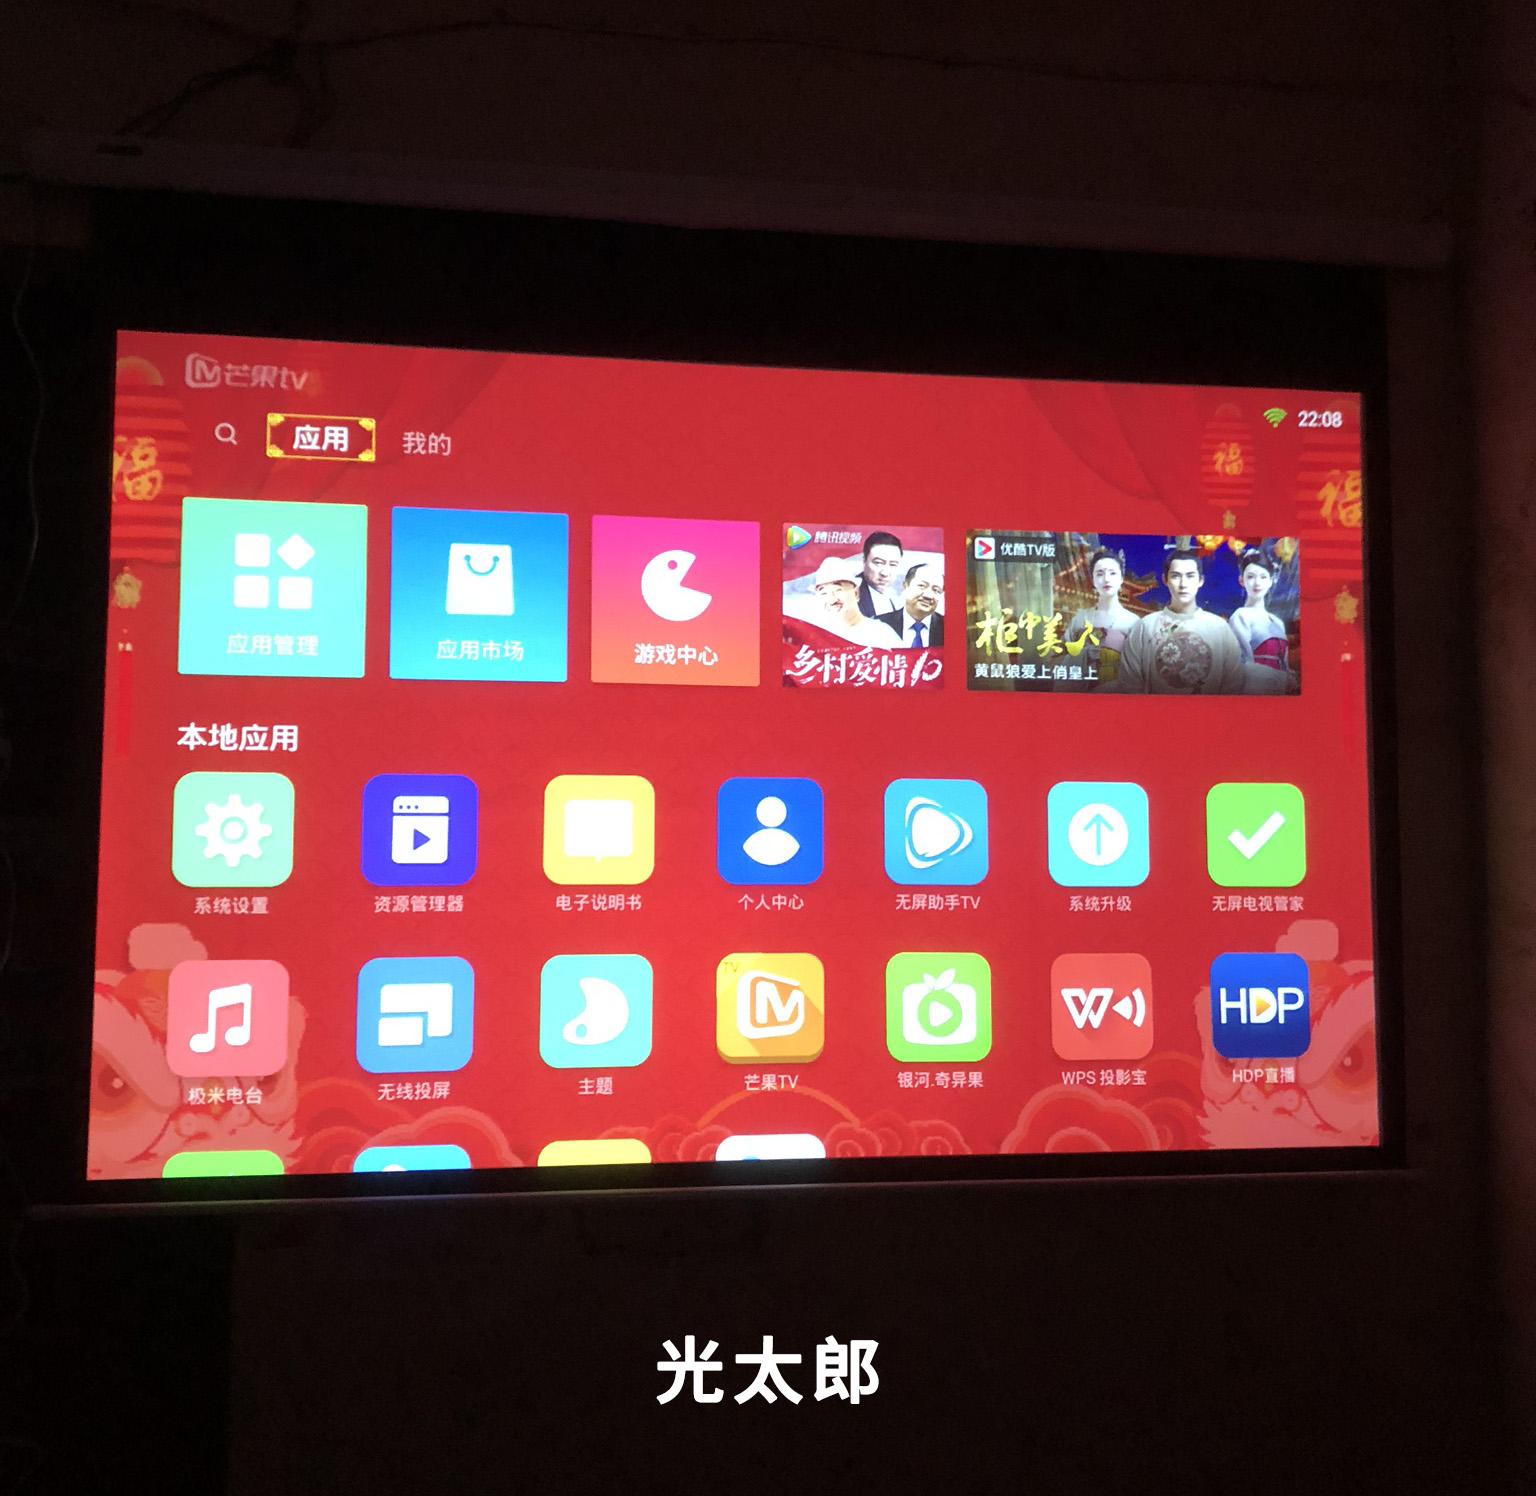 UI 3.0.jpg